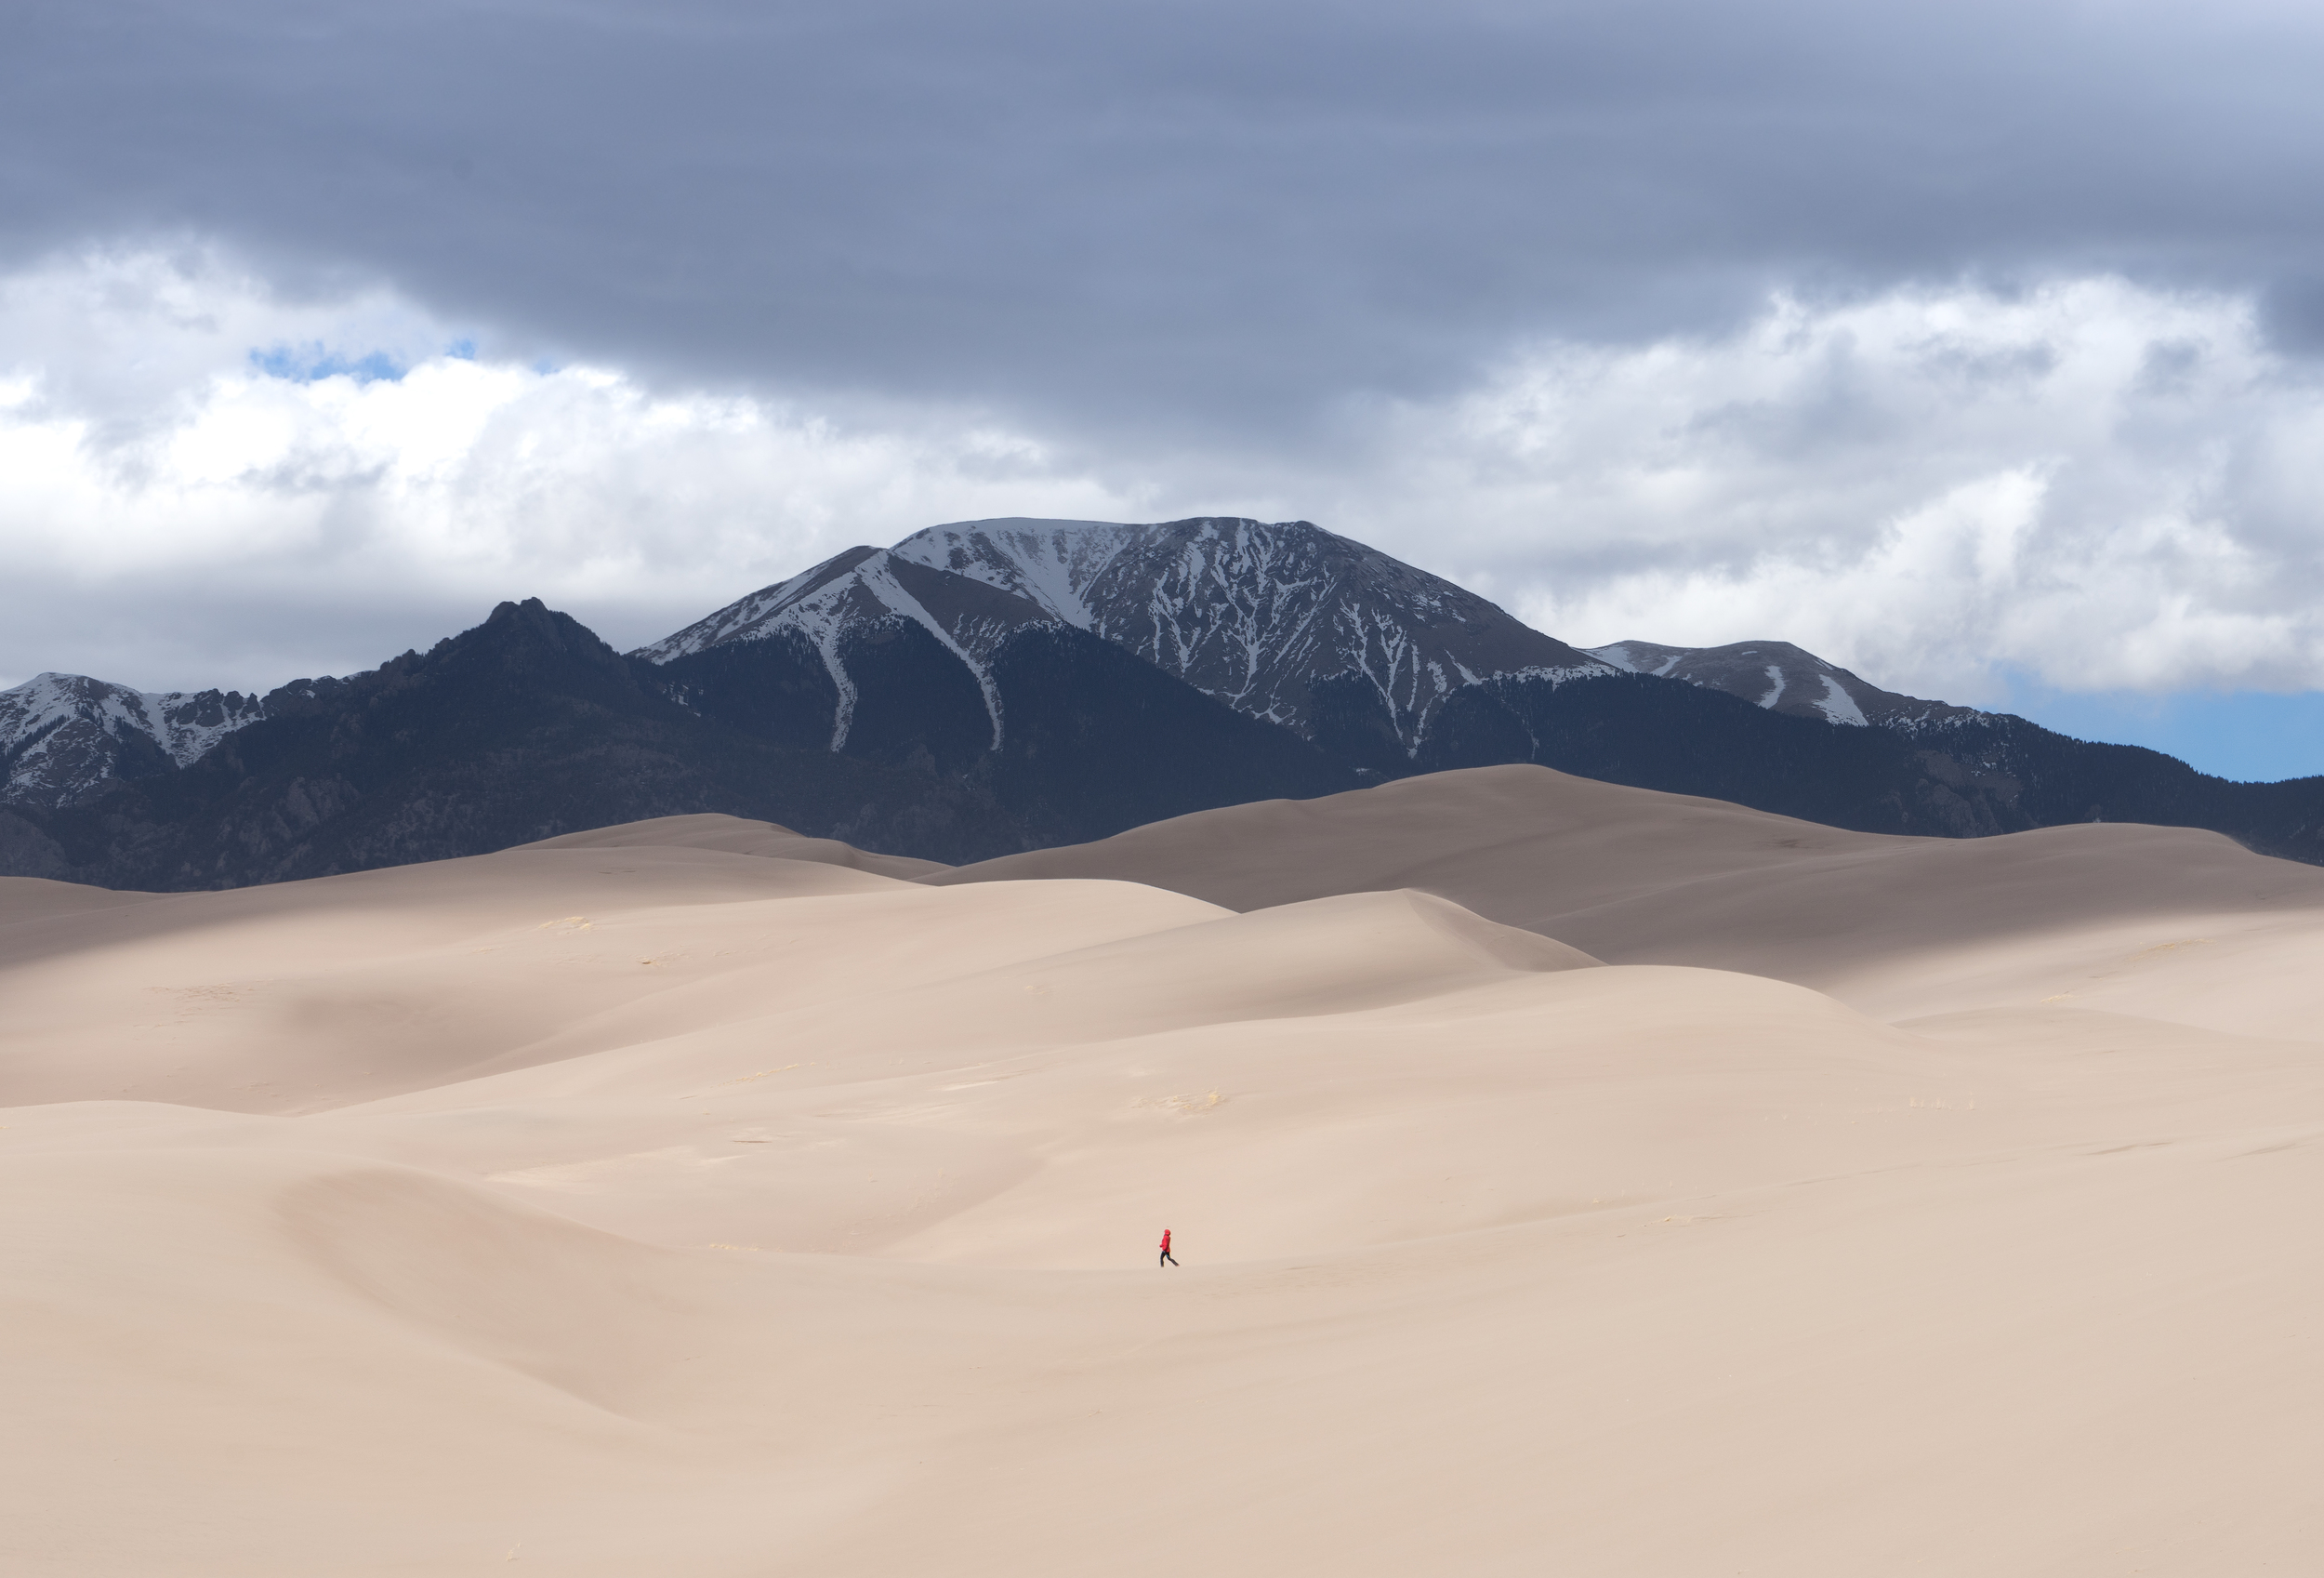 the national parks girl_great sand dunes national park_backcountry camping_canon6d_mount herard_sangre de cristo range.JPG